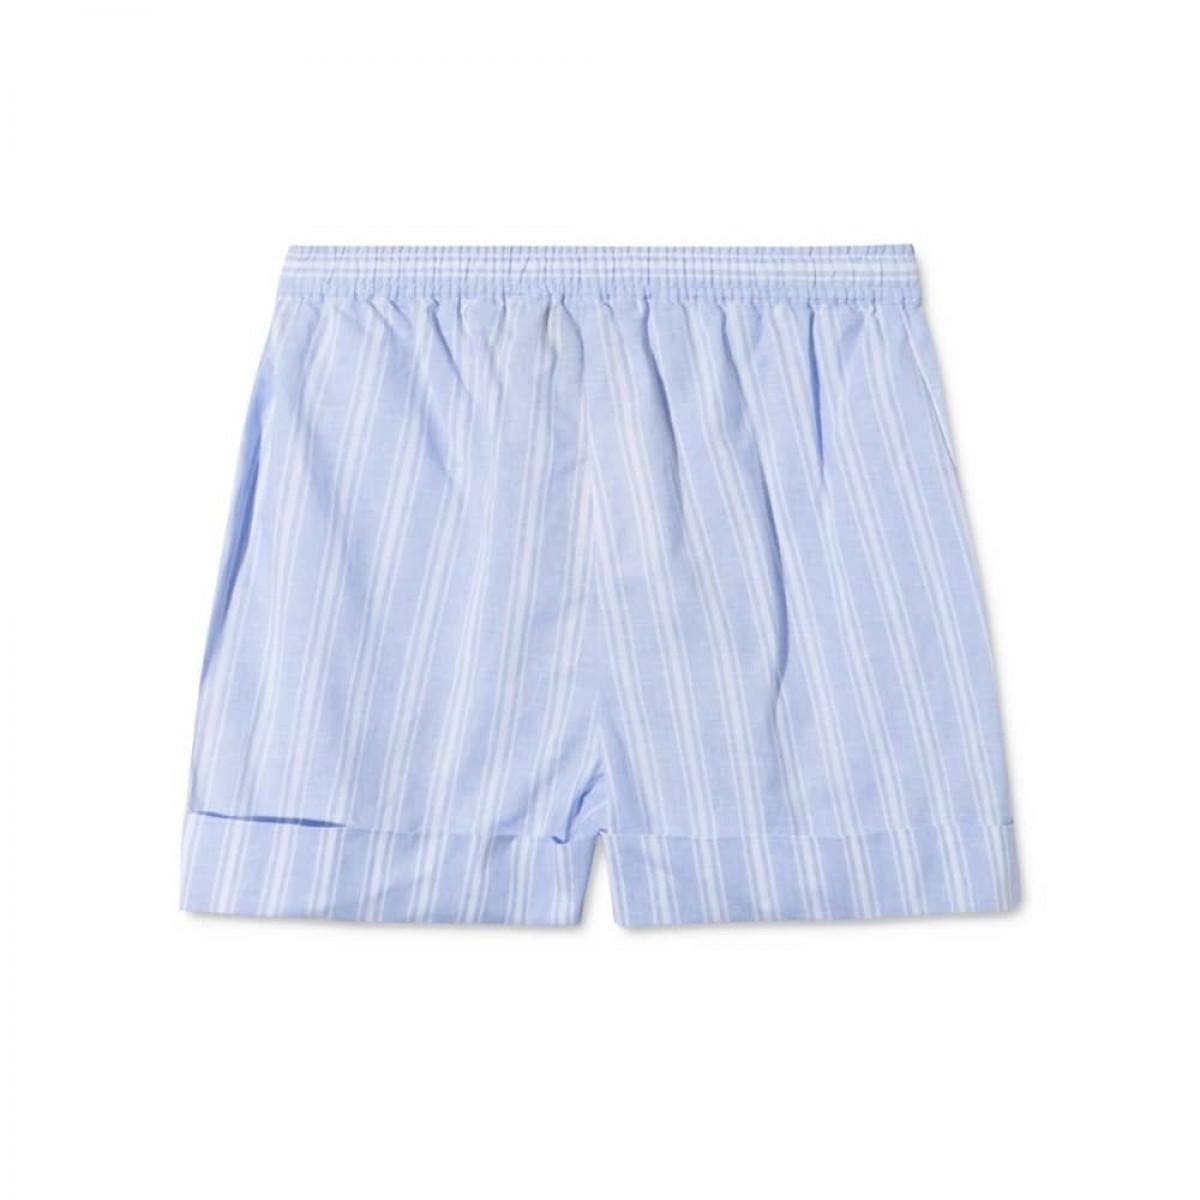 peony shorts - blue/white stripe - bag